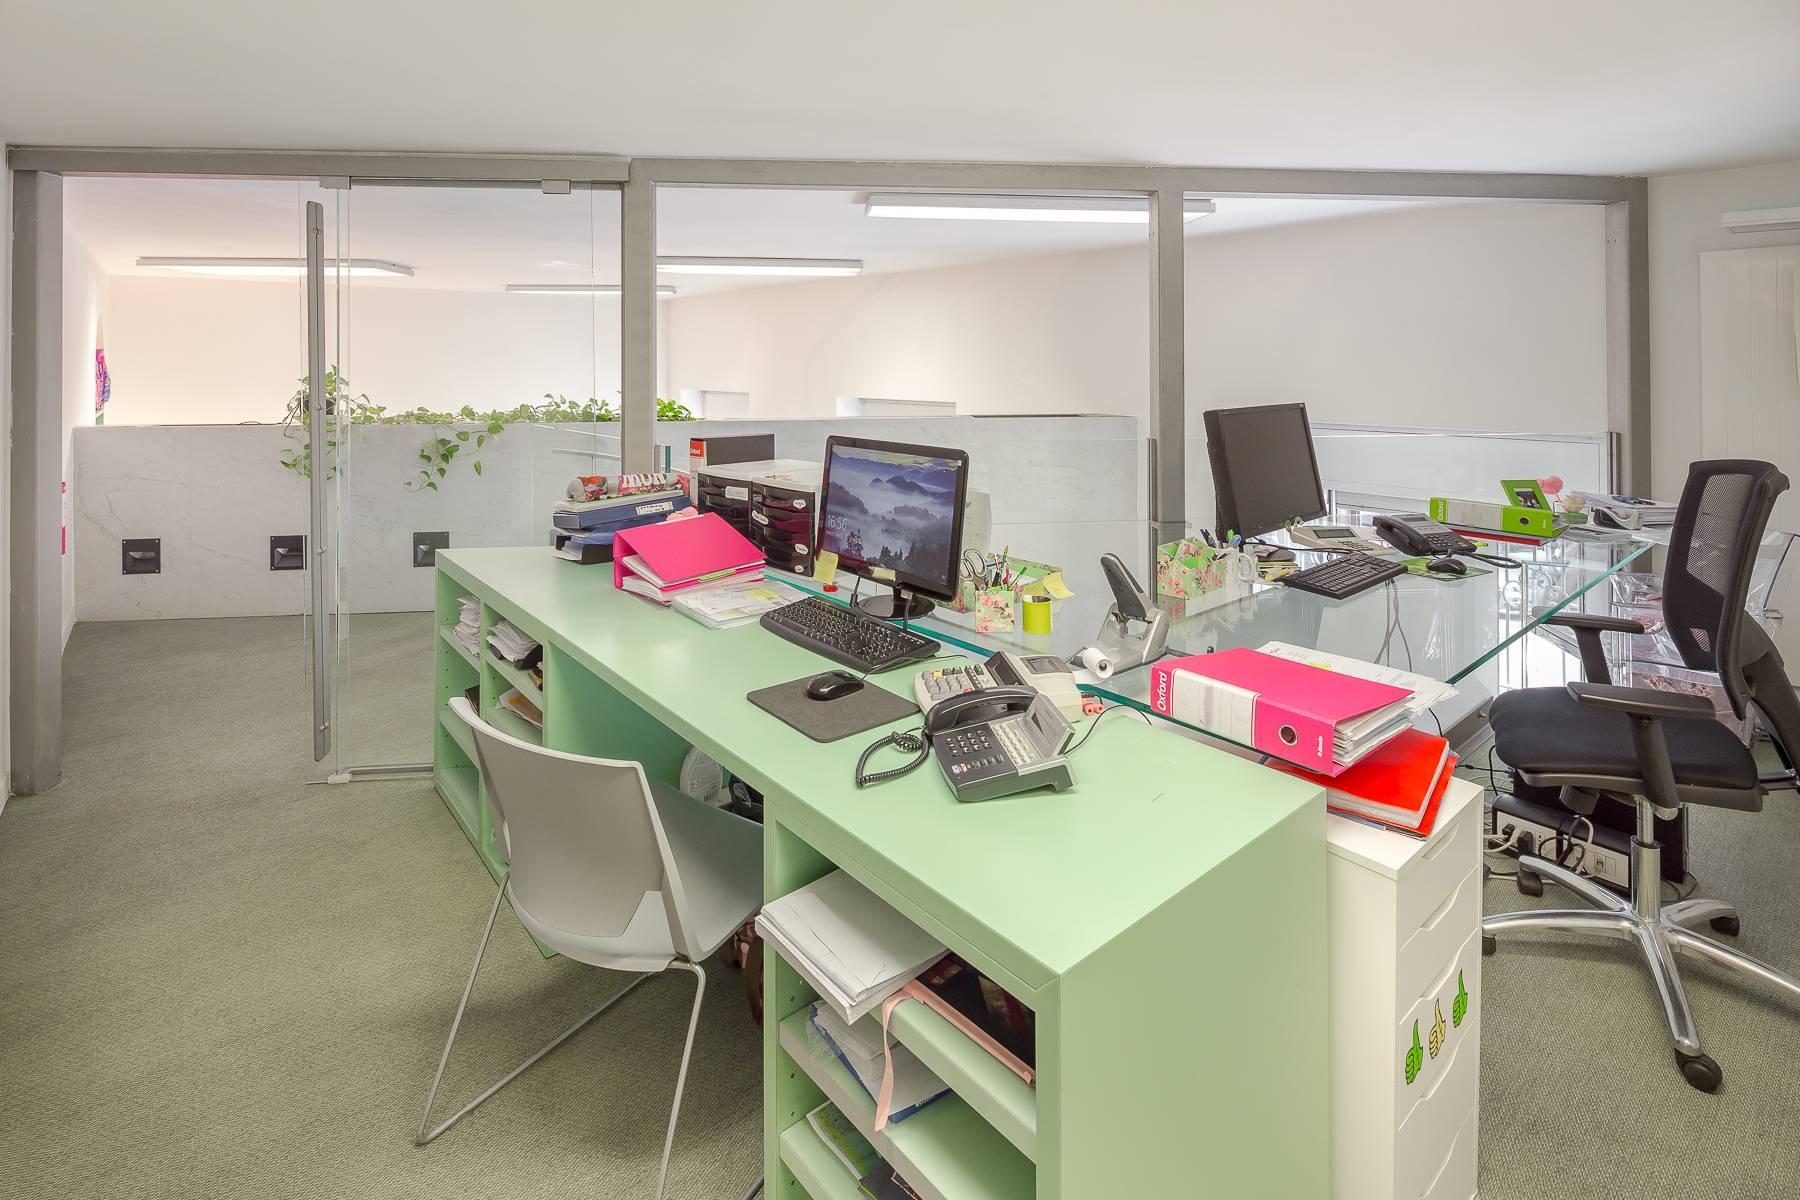 Open space office/residential property in Piazza Giovine Italia/Via Aurelio Saffi - 8